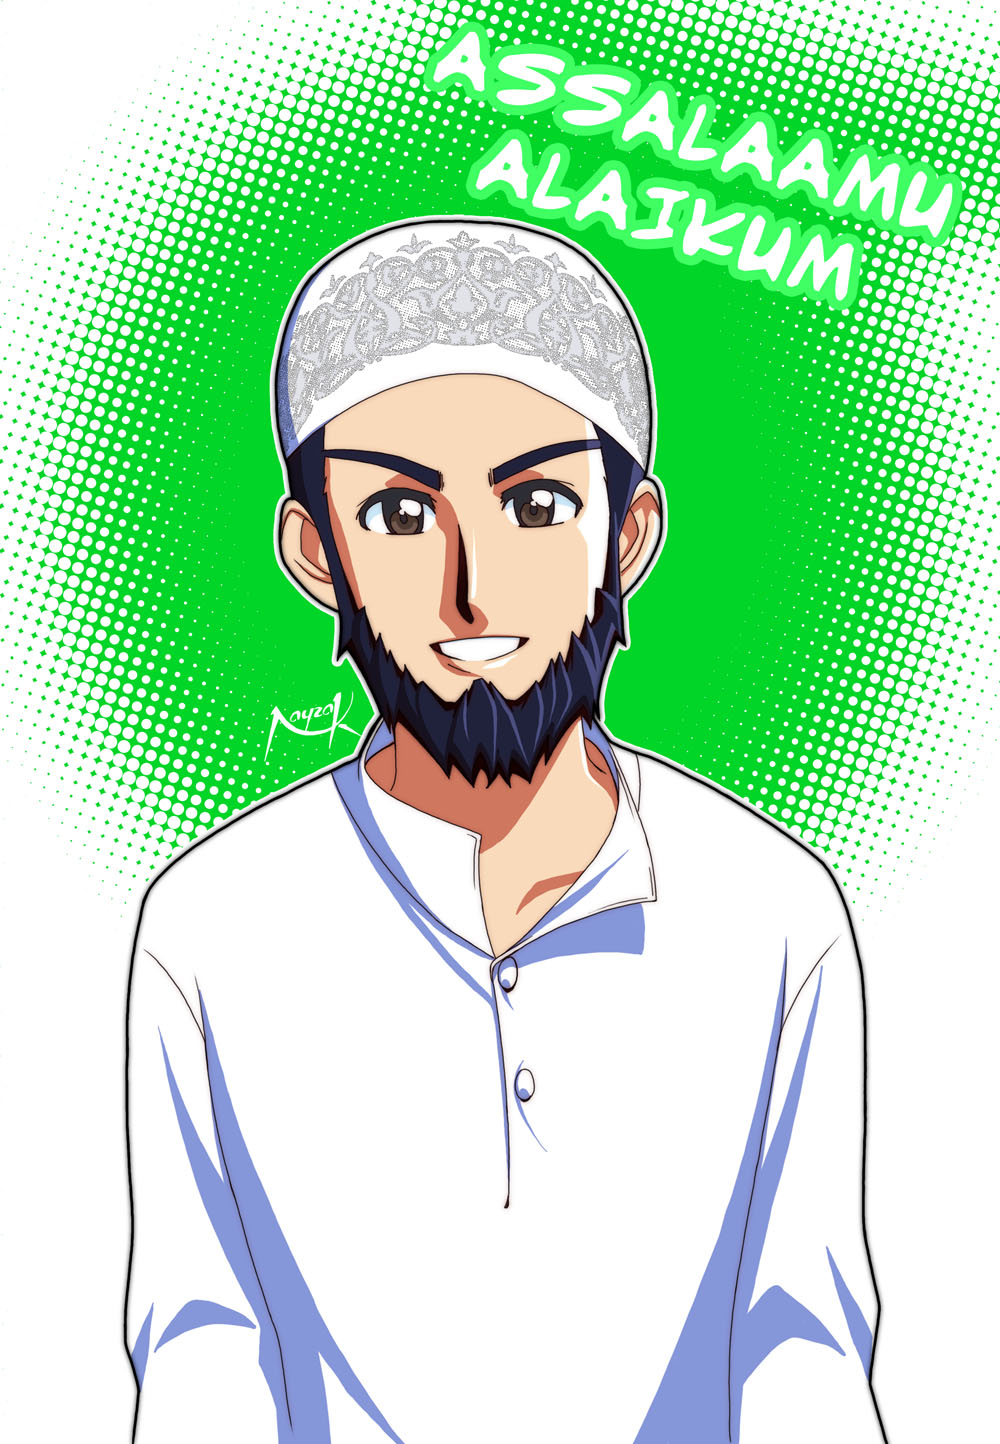 Manga-Style Muslim Man Drawing - Drawings | IslamicArtDB.com